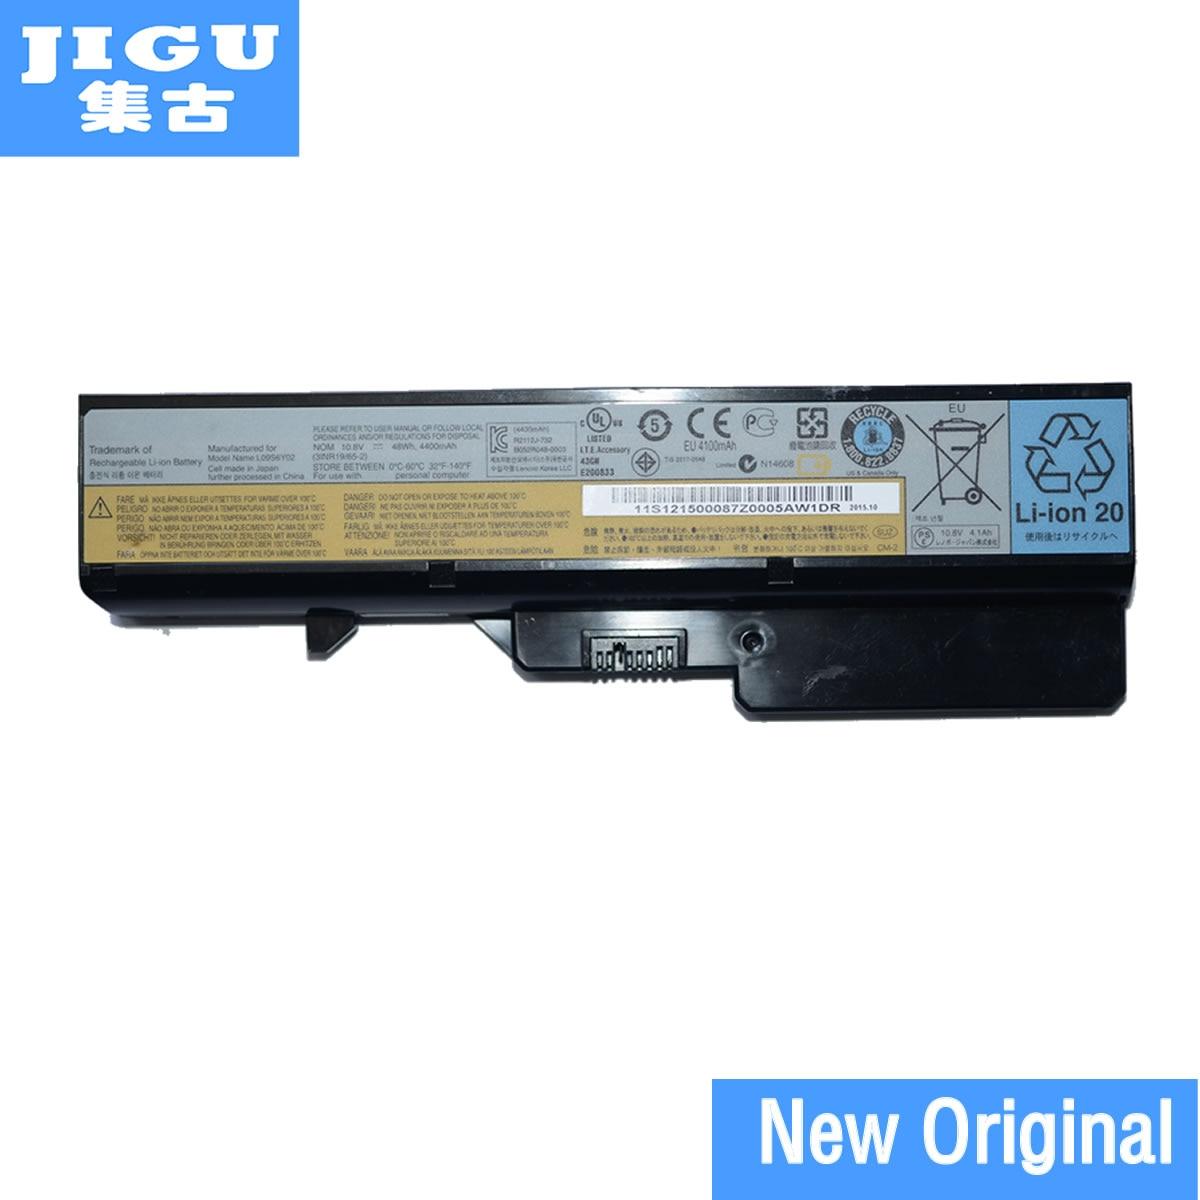 JIGU Original batería para portátil Lenovo G770 G780 V300 V360A V360G V370 V370A Z370 Z370G Z460 Z460M Z465A Z470G Z560